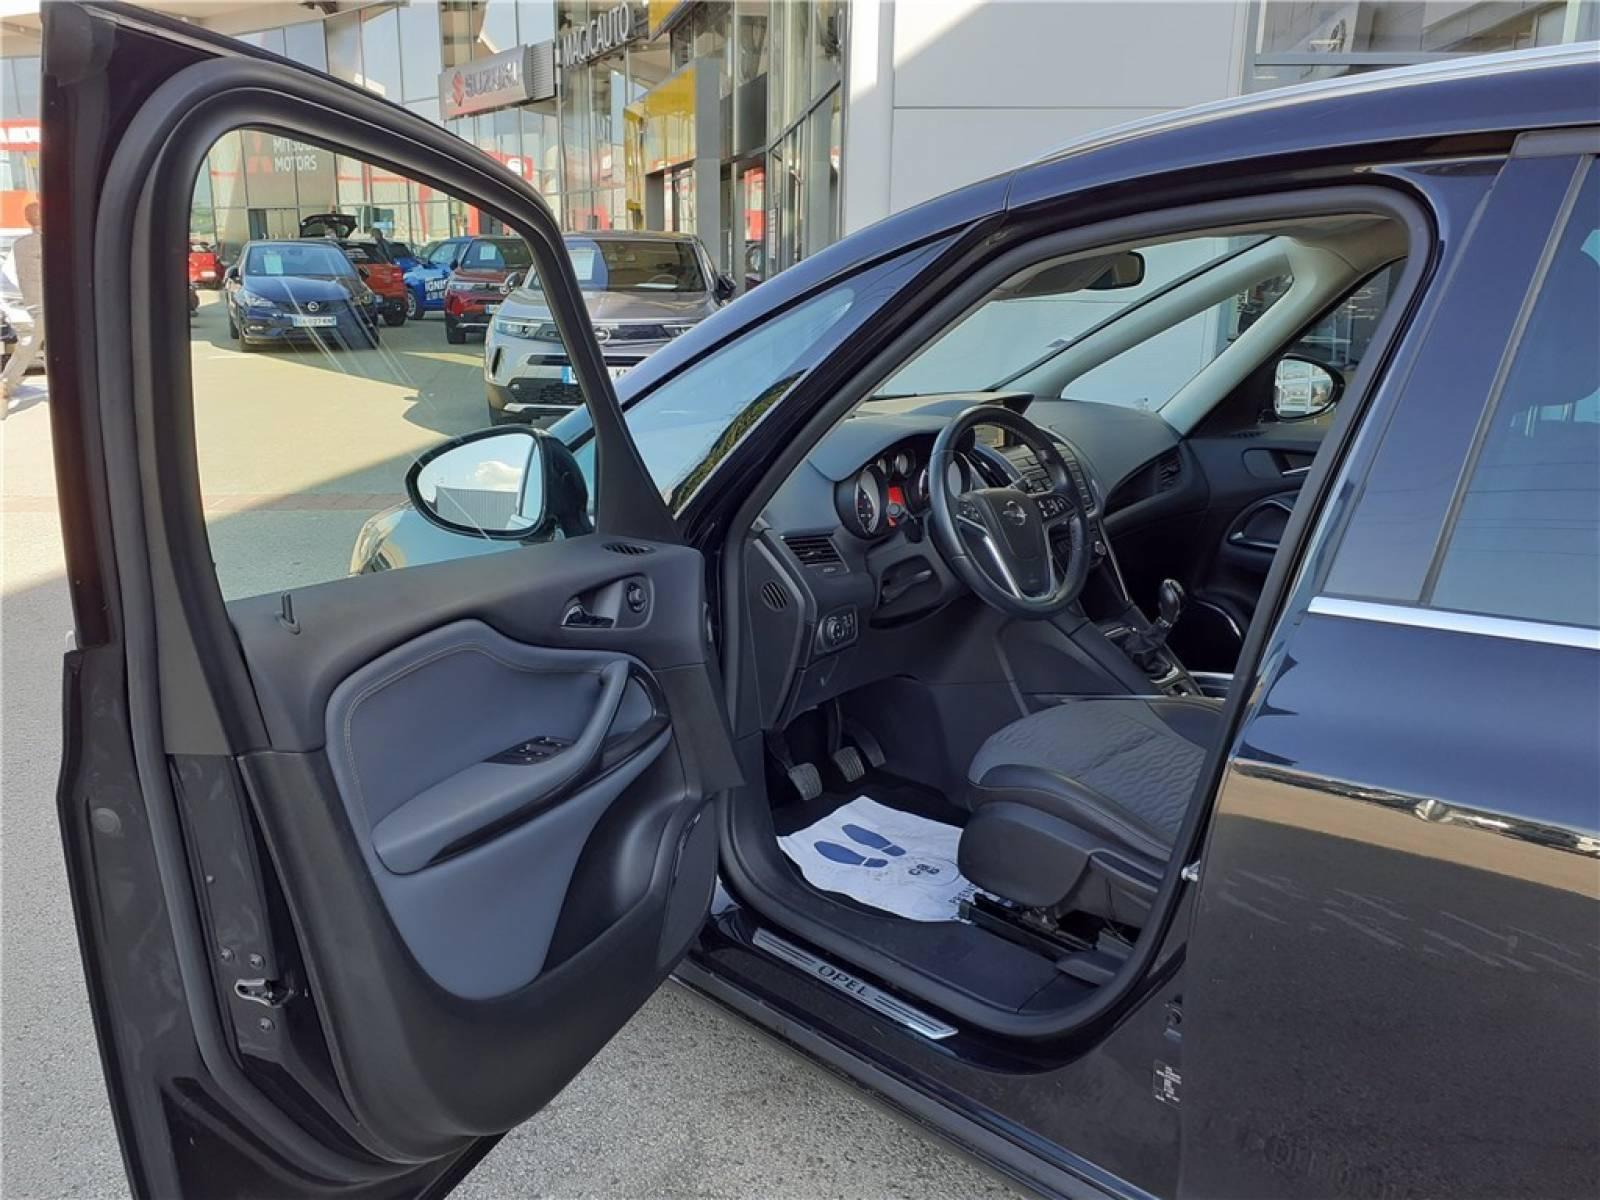 OPEL Zafira Tourer 1.4 Turbo 140 ch Start/Stop EcoFlex - véhicule d'occasion - Groupe Guillet - Opel Magicauto - Chalon-sur-Saône - 71380 - Saint-Marcel - 18